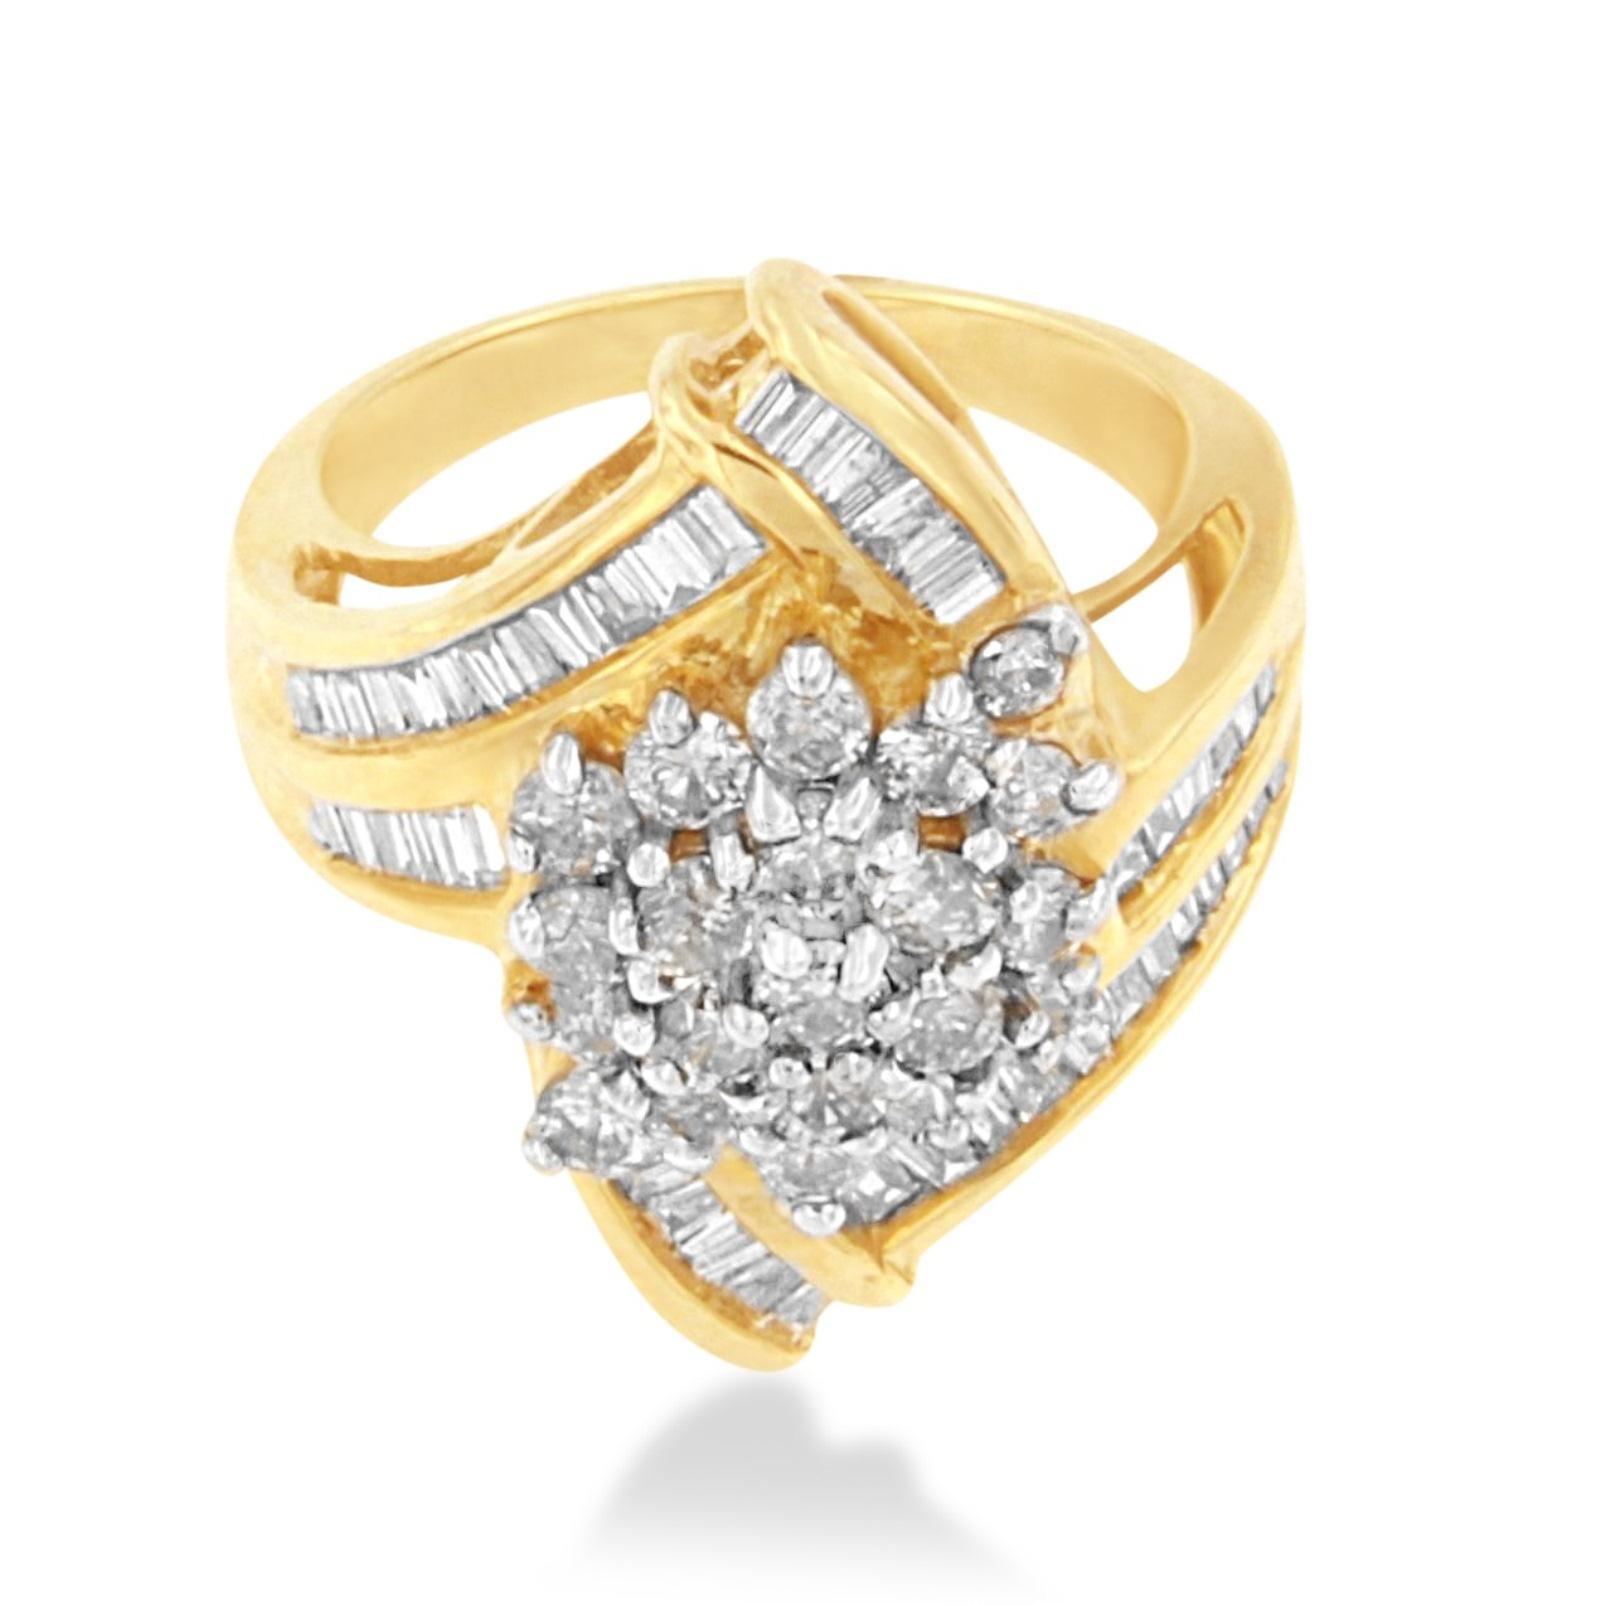 b sears wedding rings Diamond